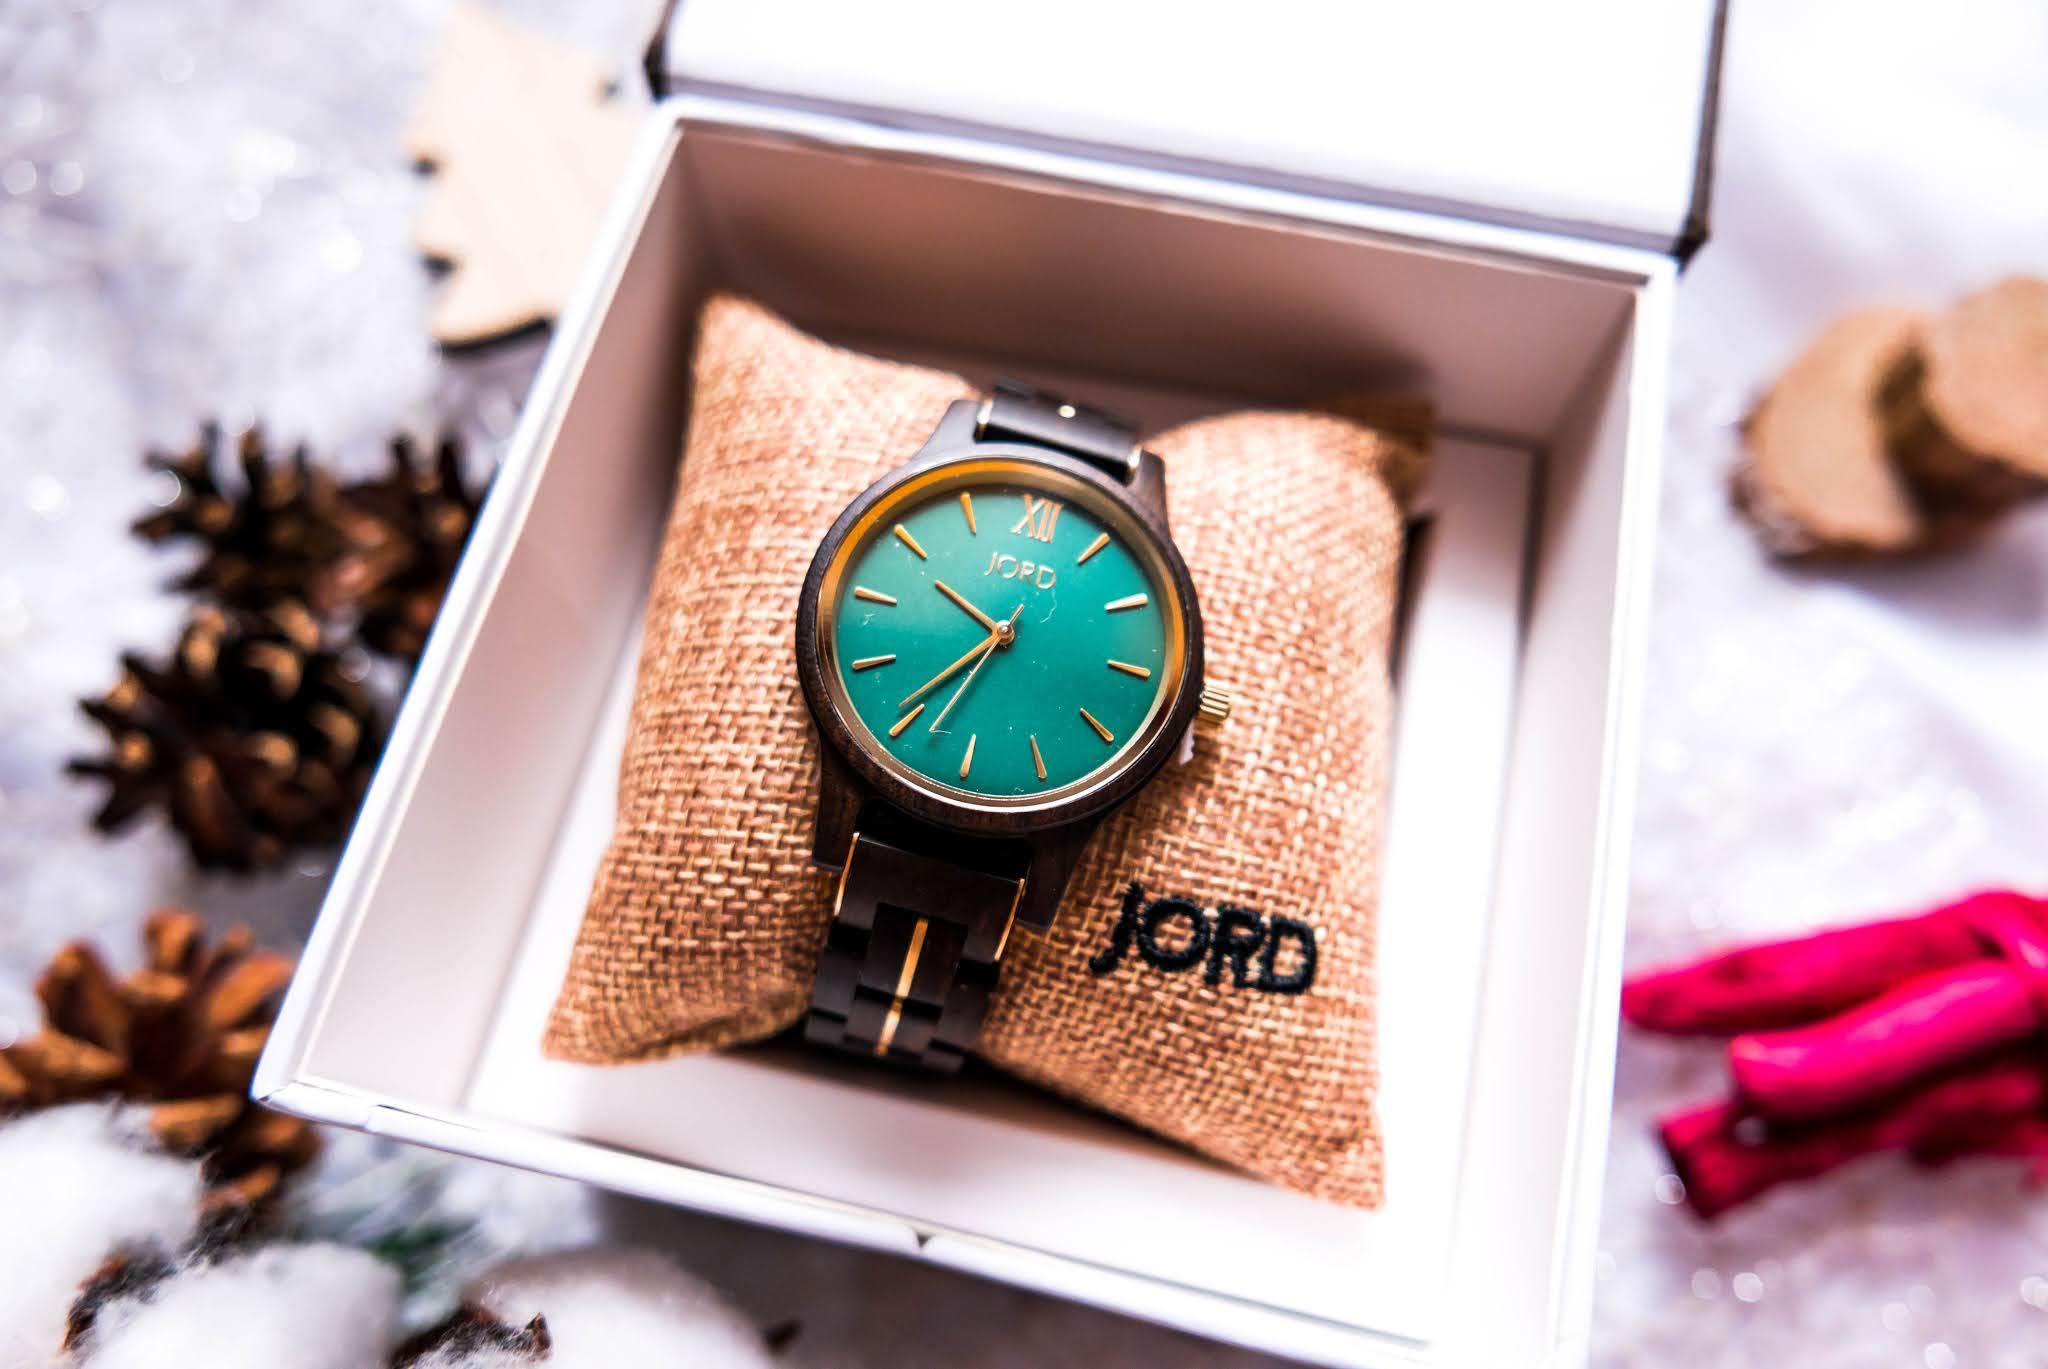 zegarek z drewna hebanowego